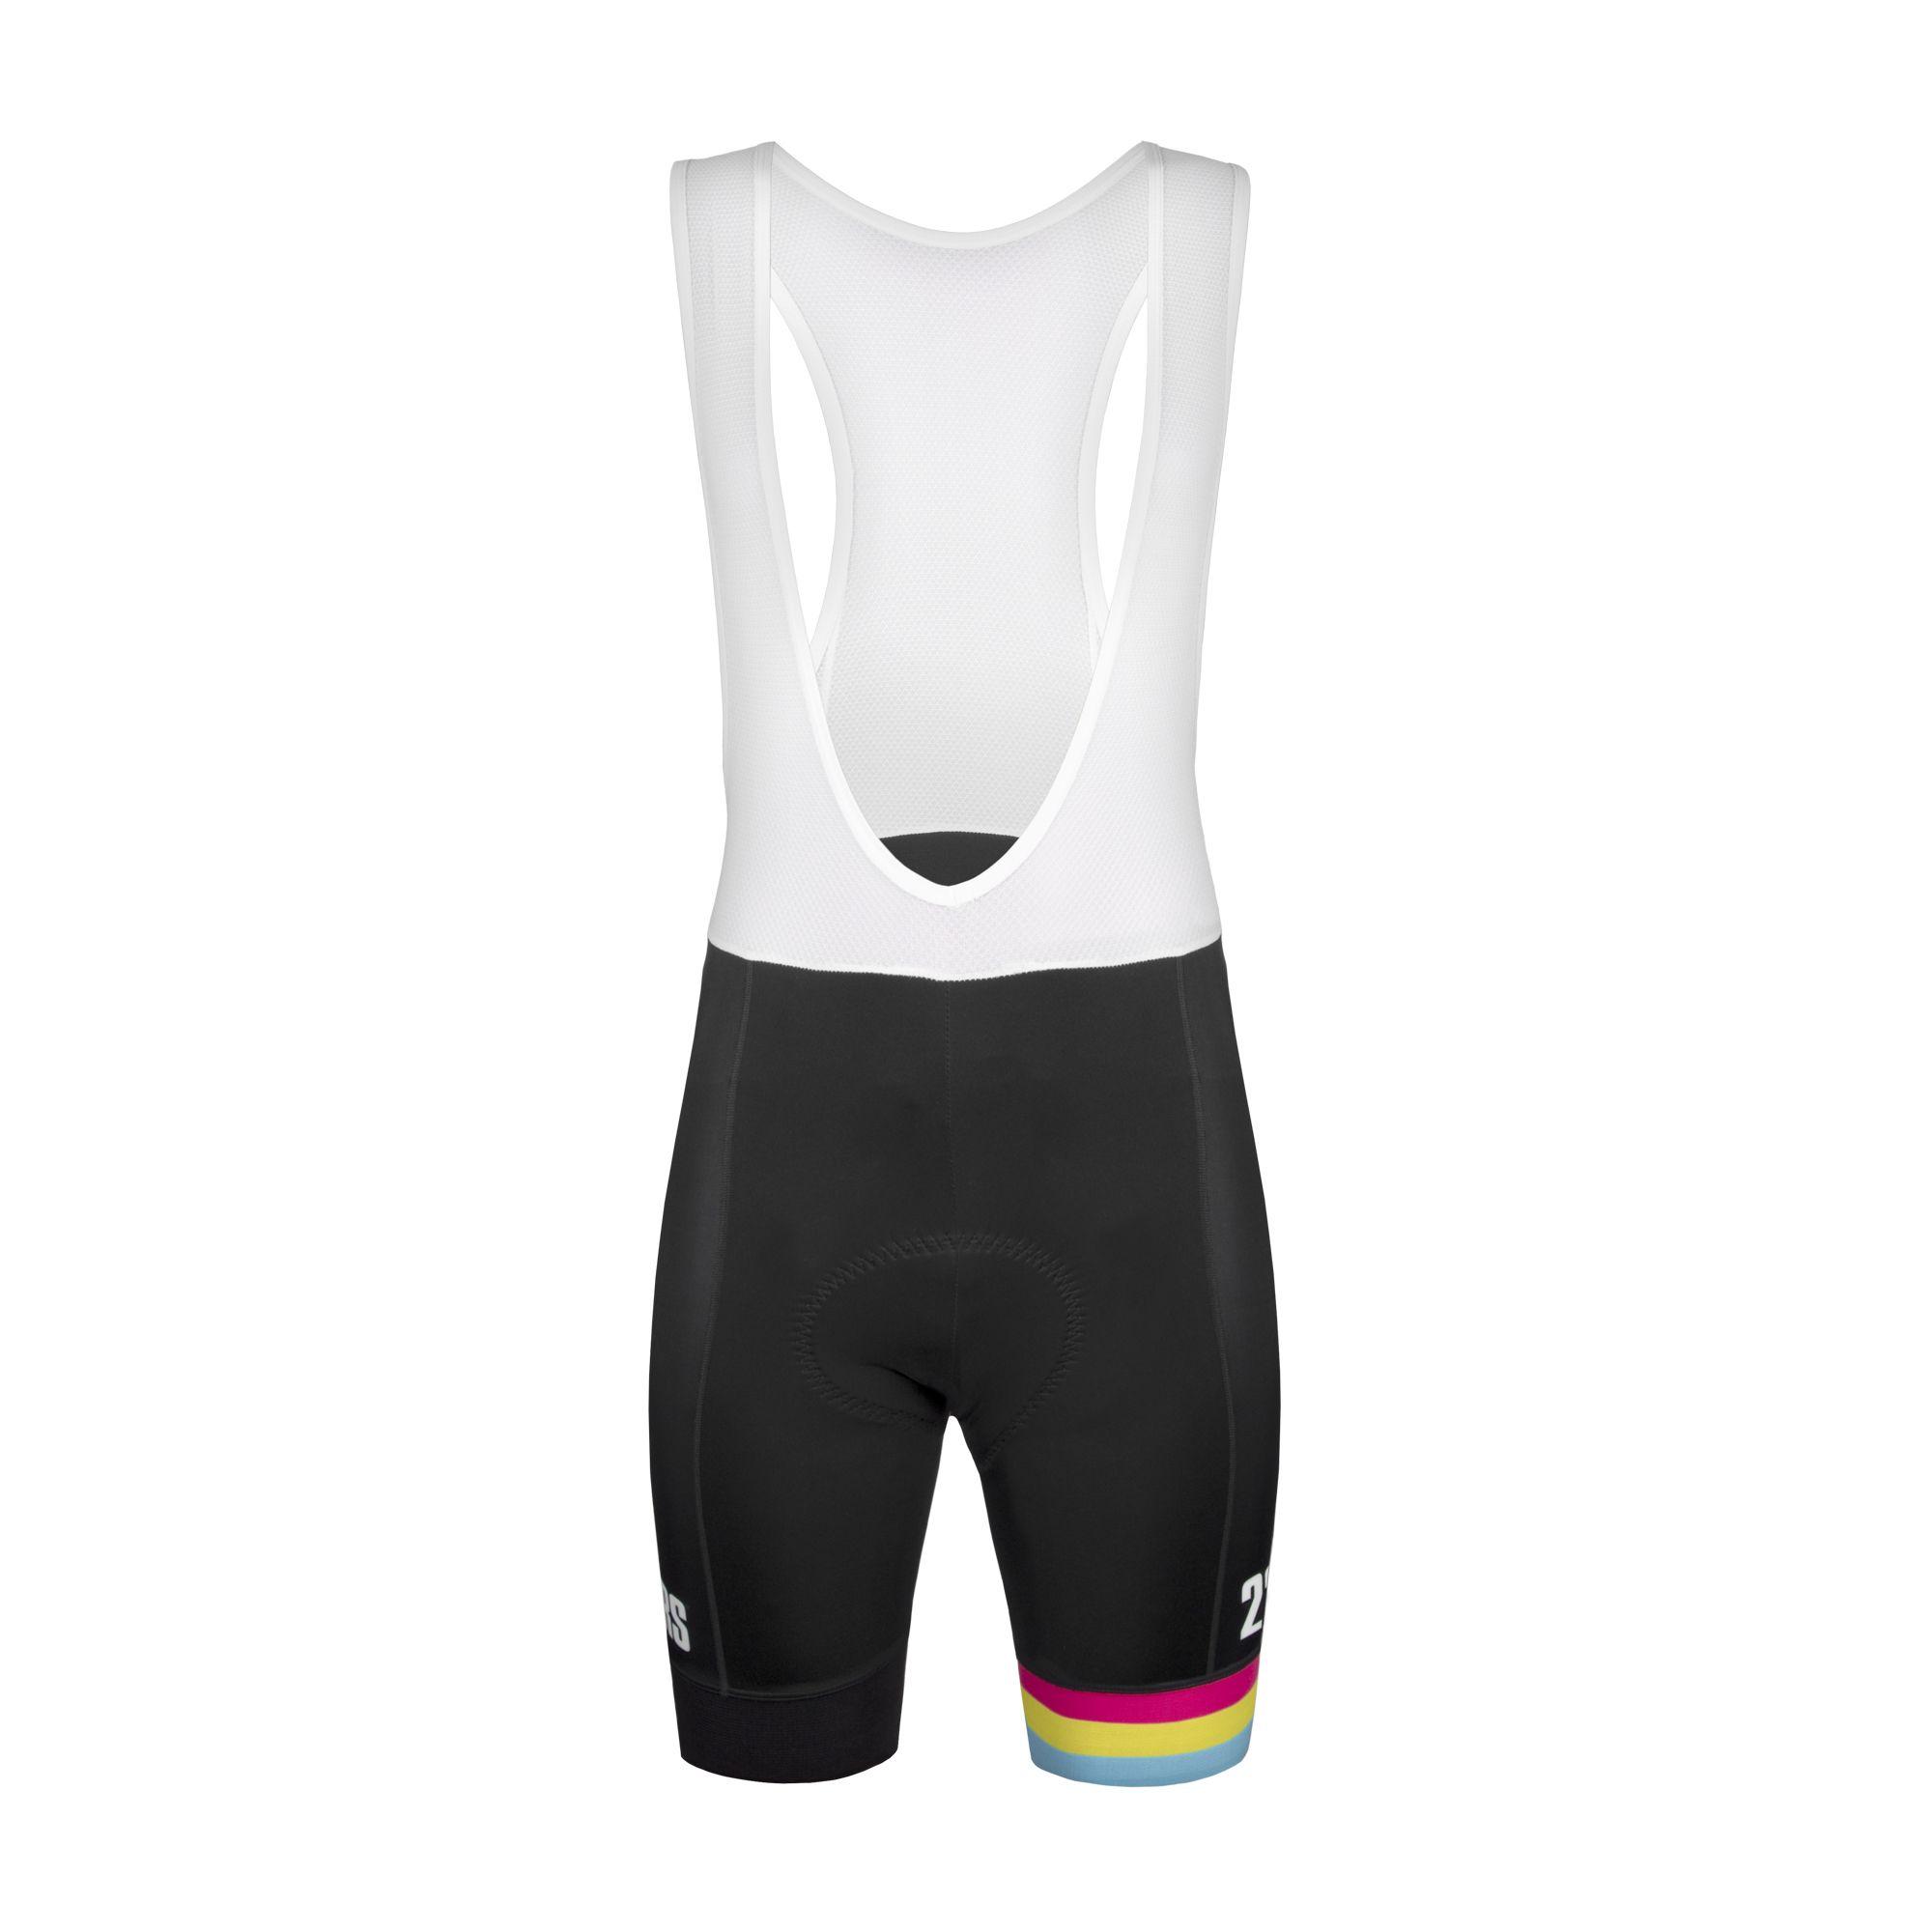 Culotte Hydrazero · Producto 226ERS · Ciclismo · Kukimbia Shop - Tienda Online Trail & Running